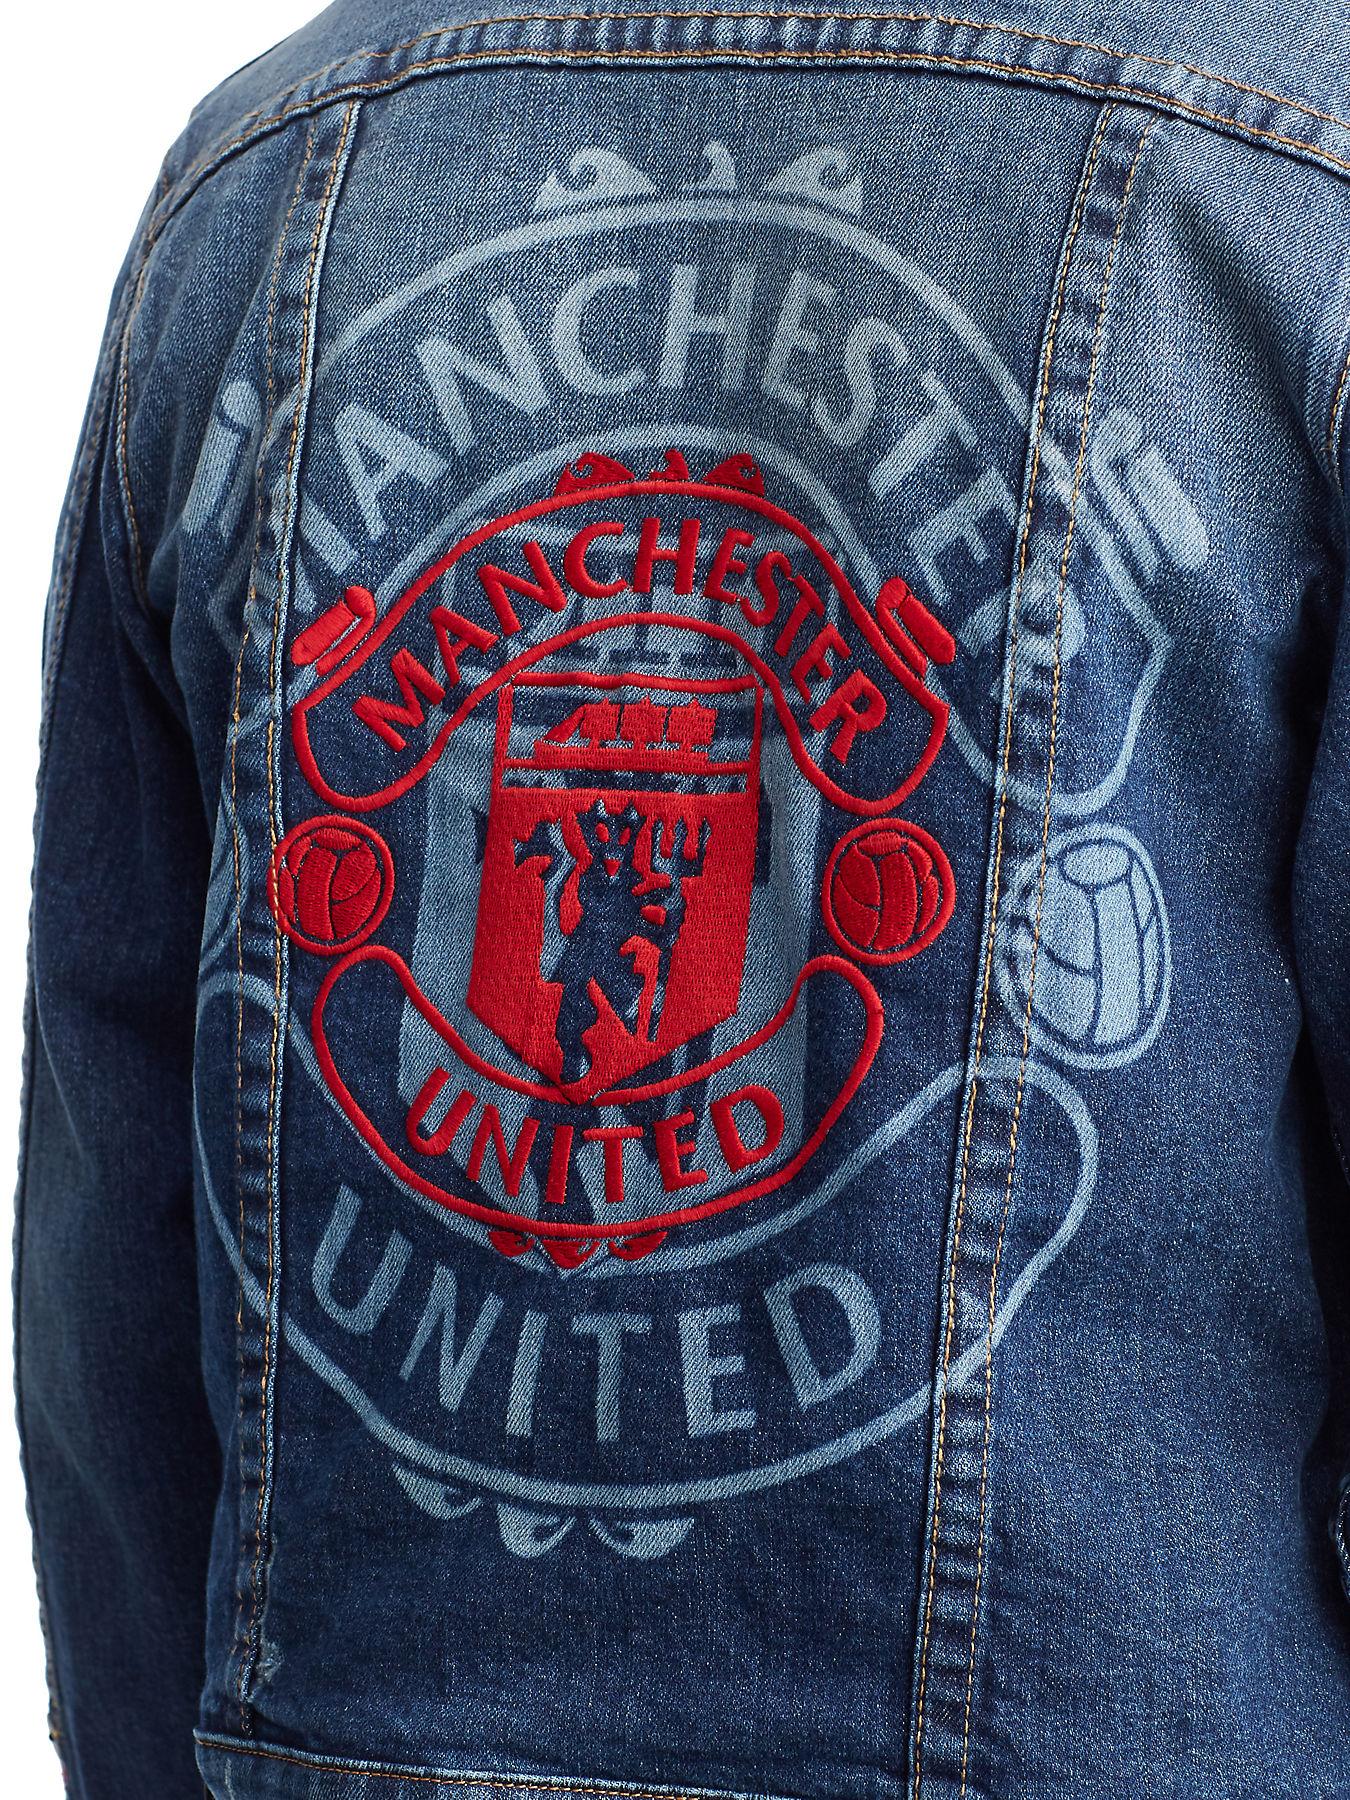 Mens Tr X Manchester United Embroidered Denim Jacket